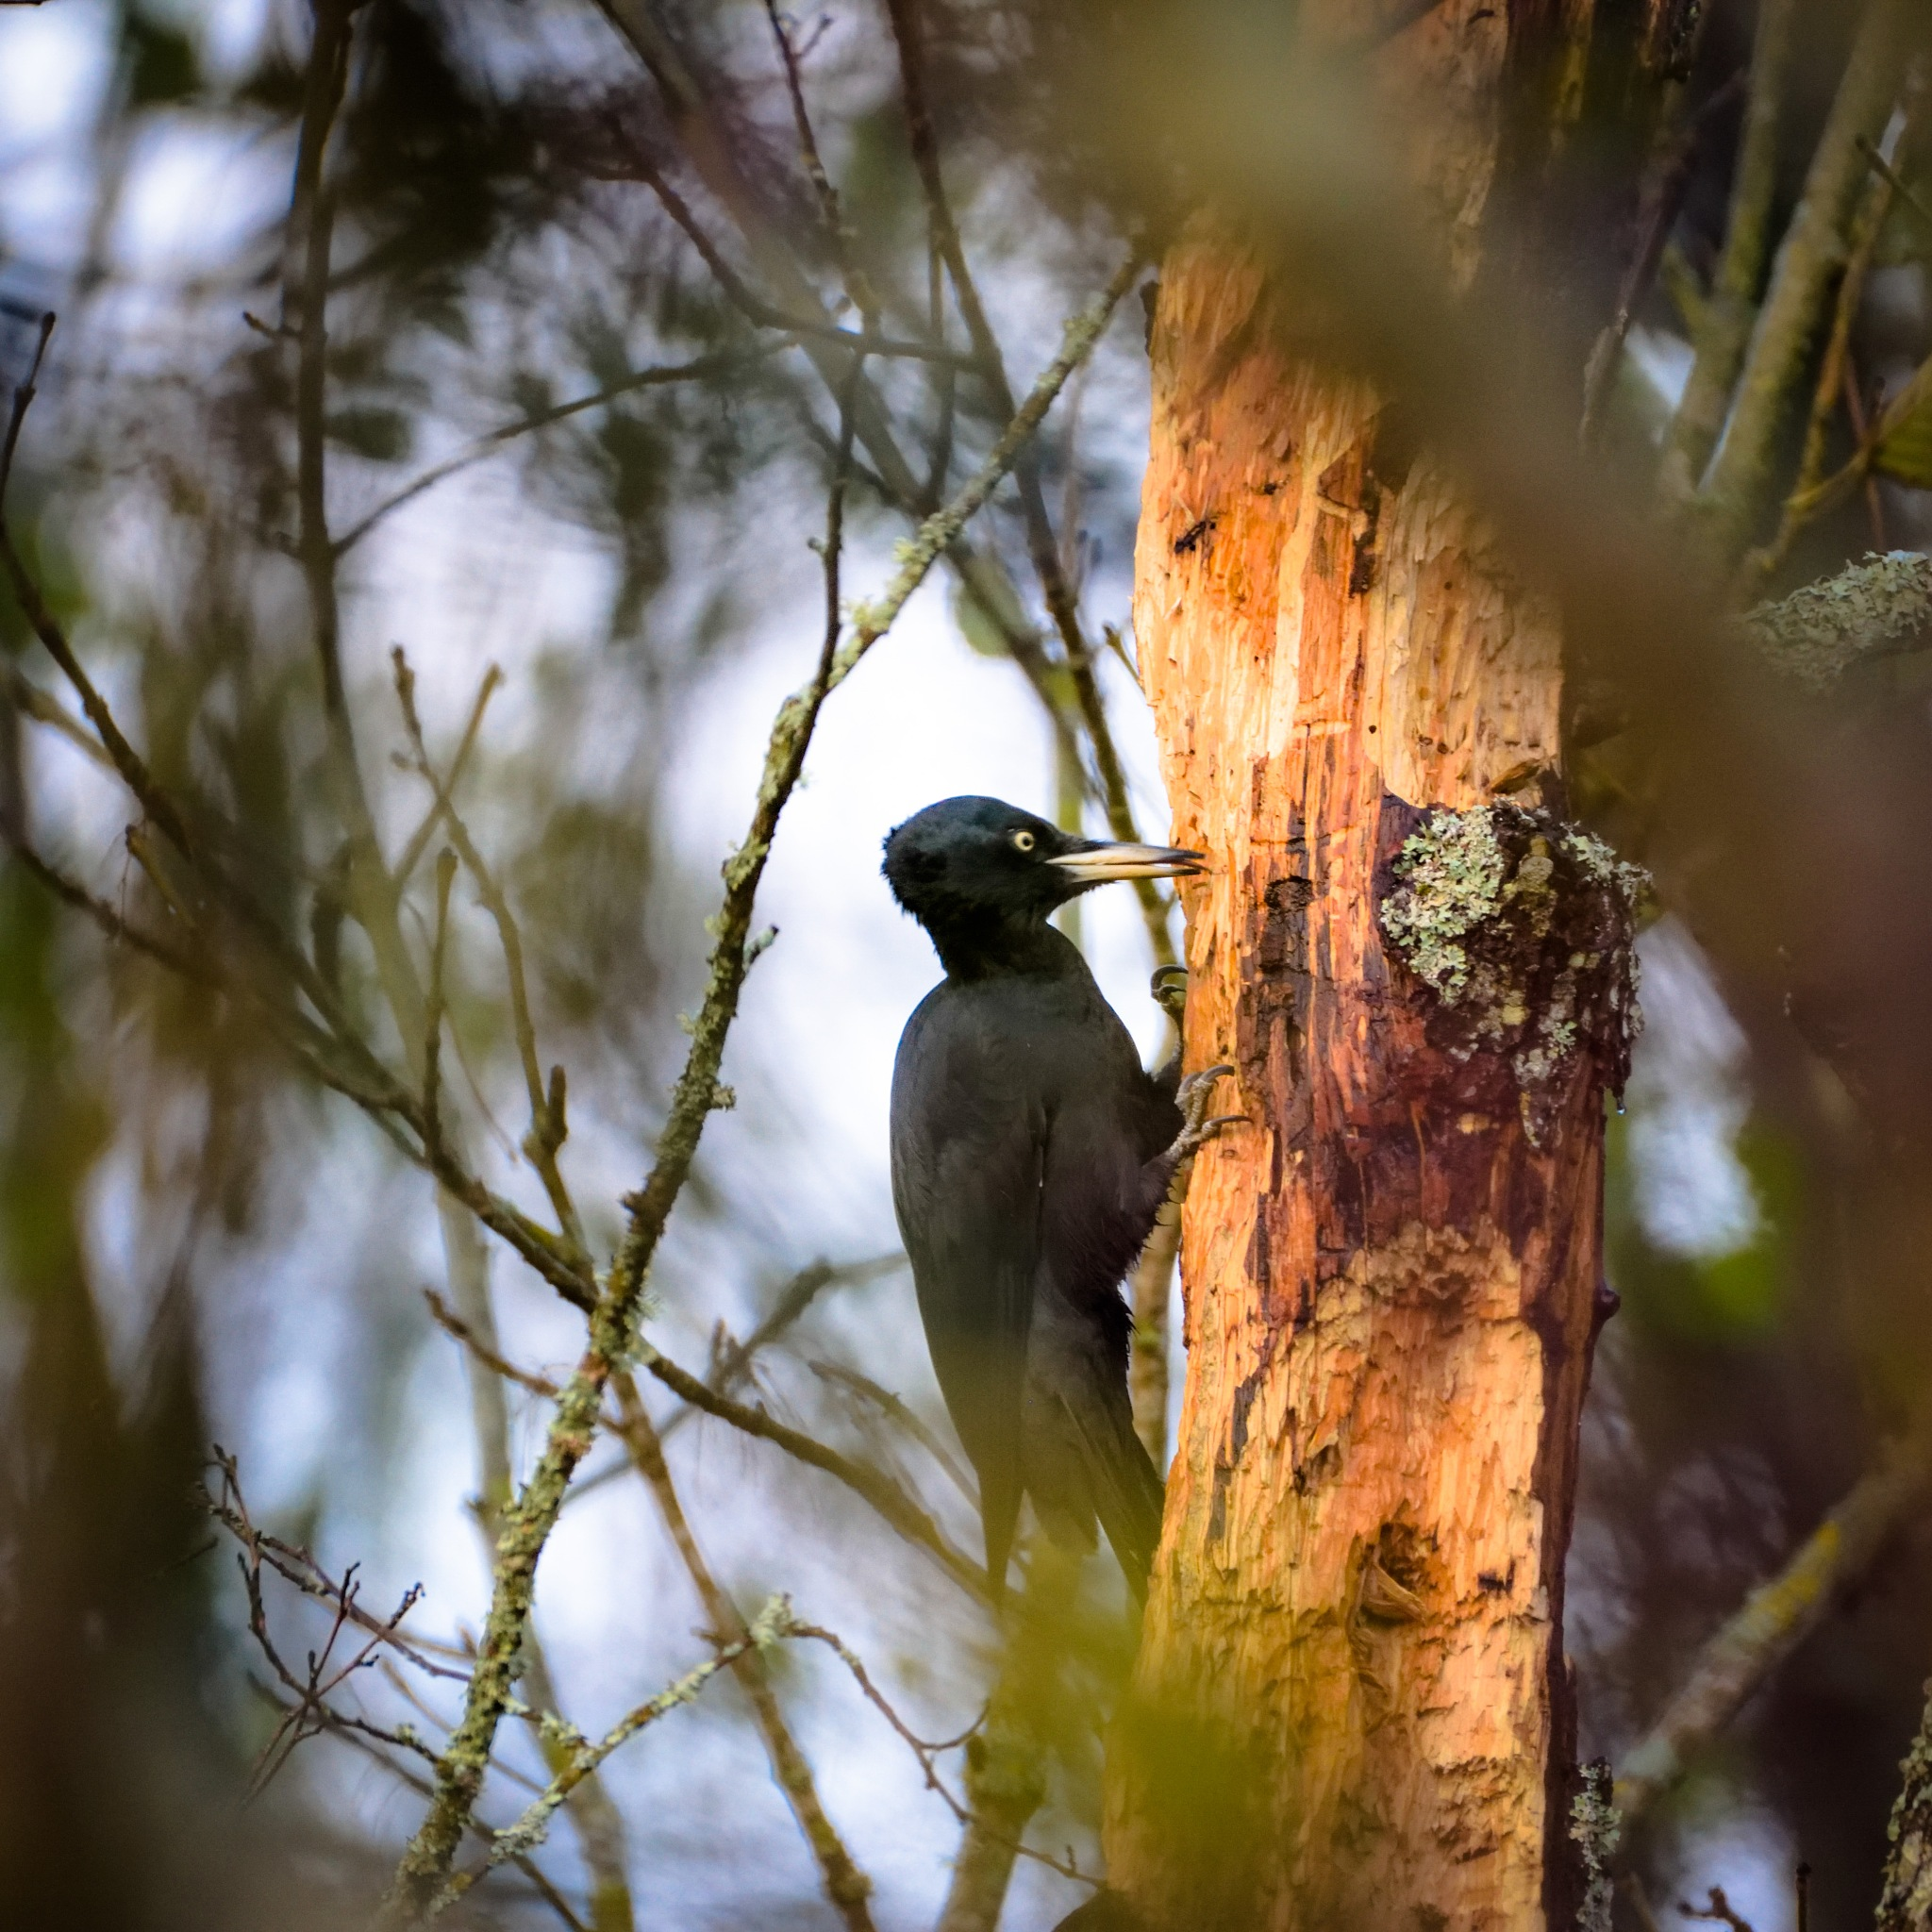 Dryocopus martius / Black Woodpecker / Schwarzspecht / Чёрный дятел by Art Wind